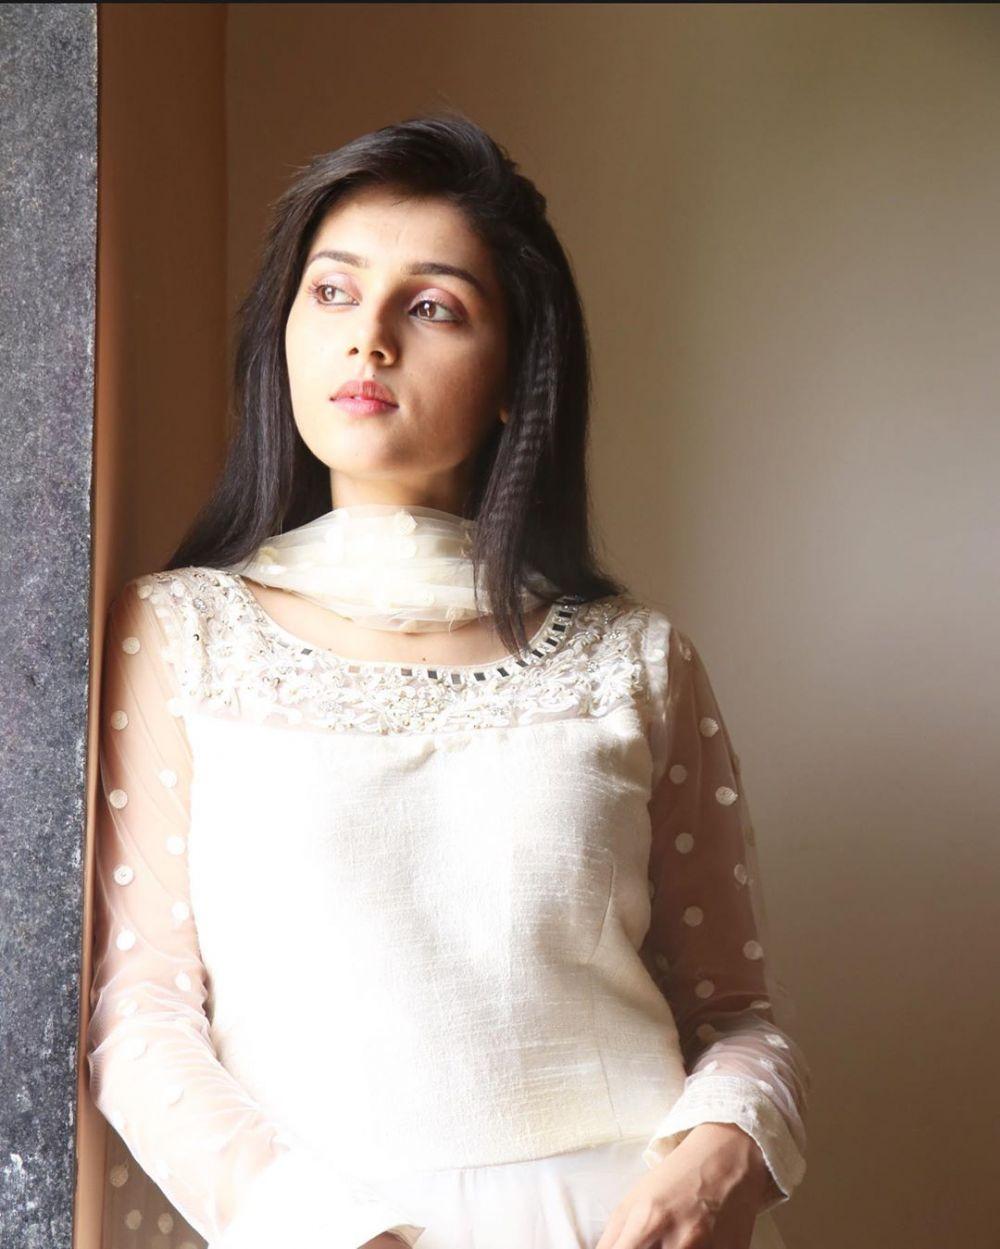 10 Potret Menawan Mallika Singh, Pemeran Radha di 'Radha Krishna'